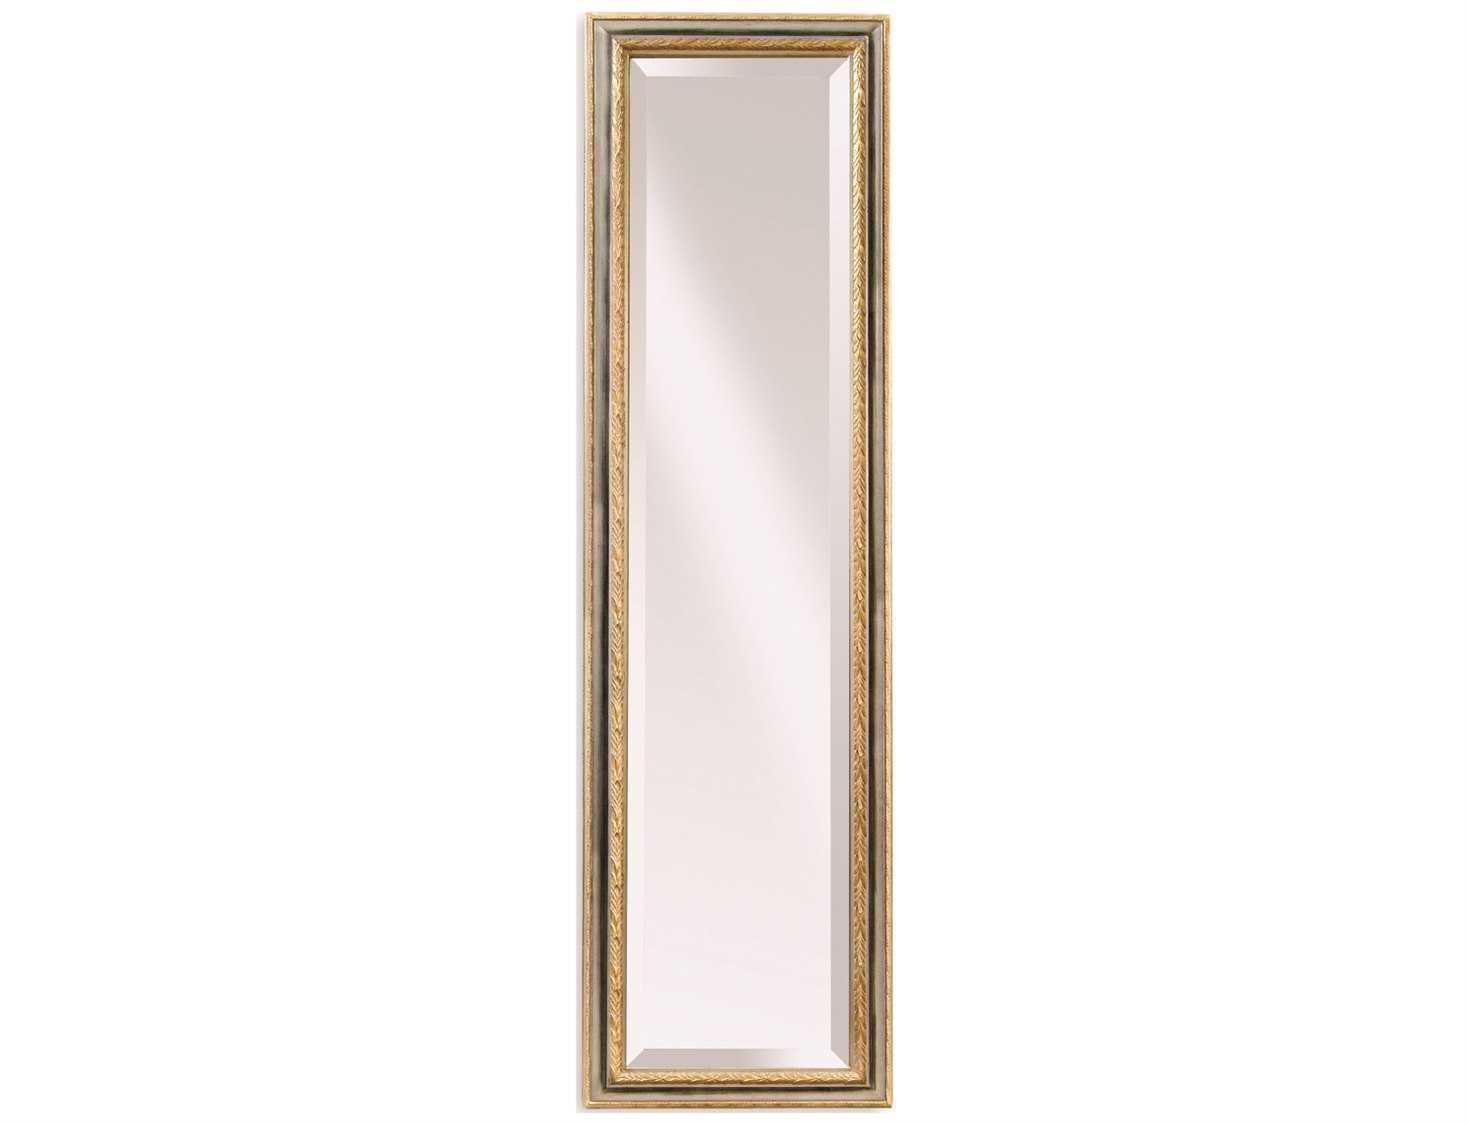 Bassett Mirror Old World 18 X 64 Silver & Gold Regis